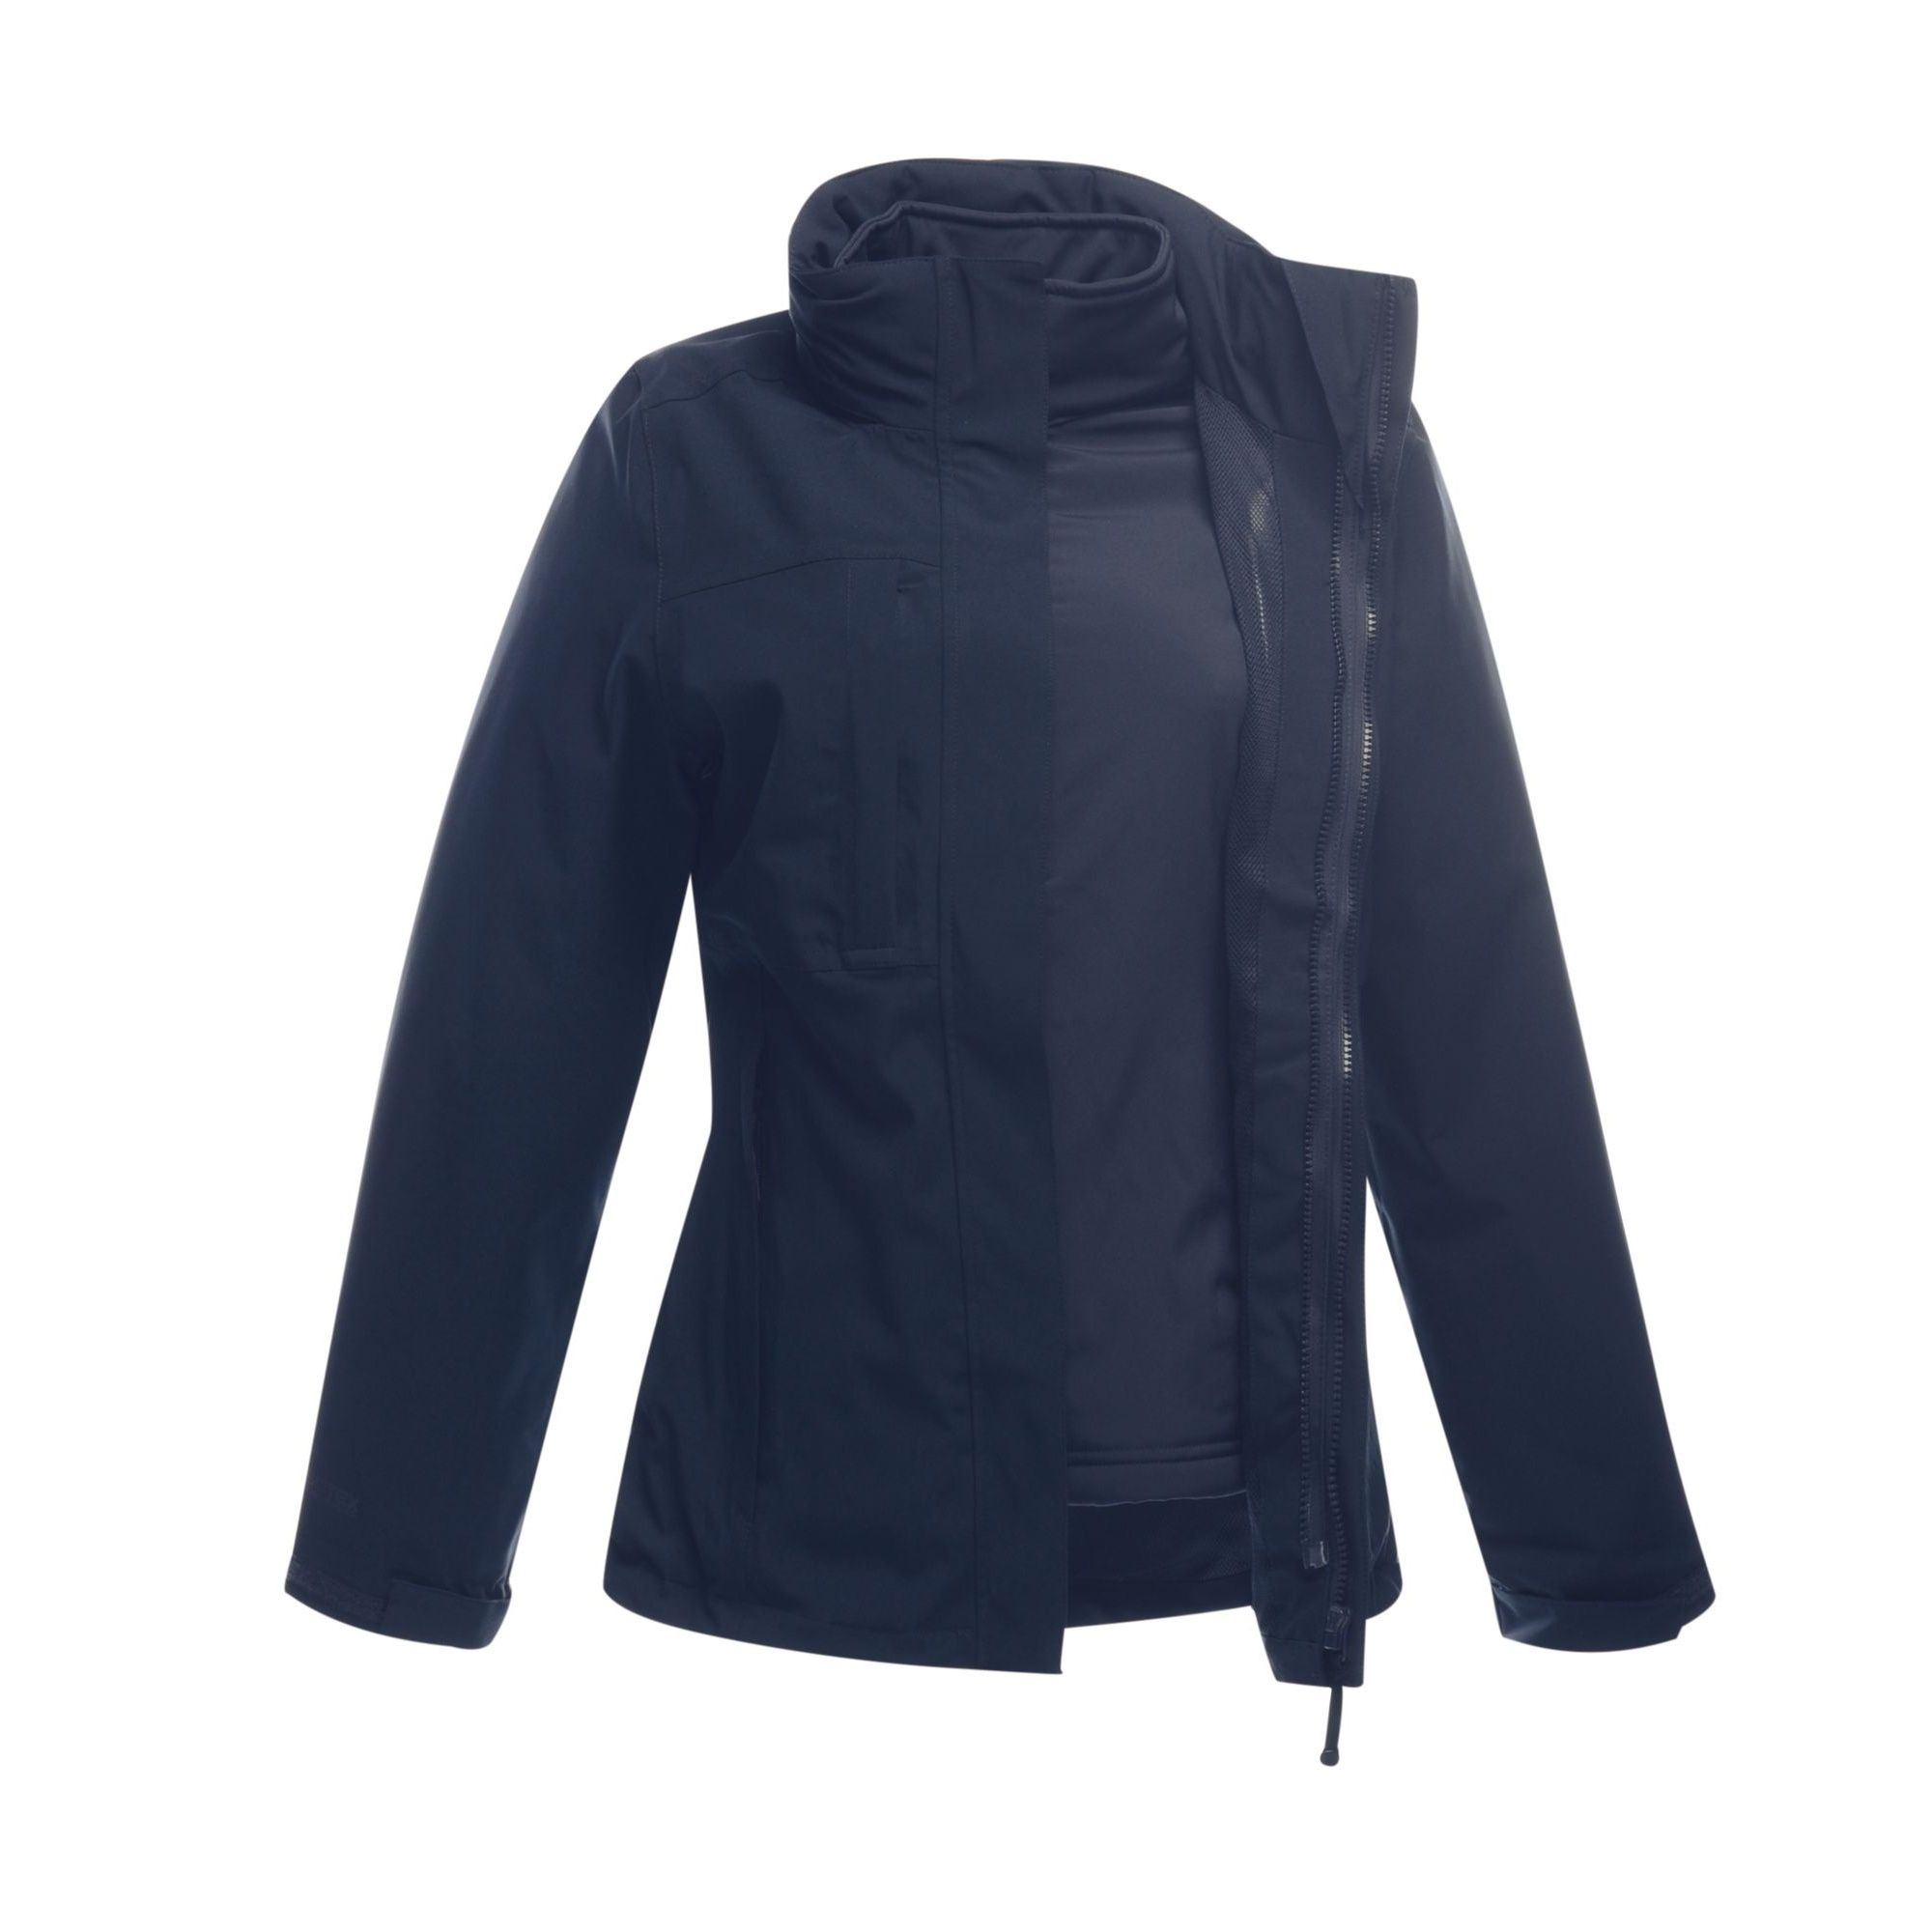 Regatta Professional Mens Kingsley 3-in-1 Waterproof Jacket